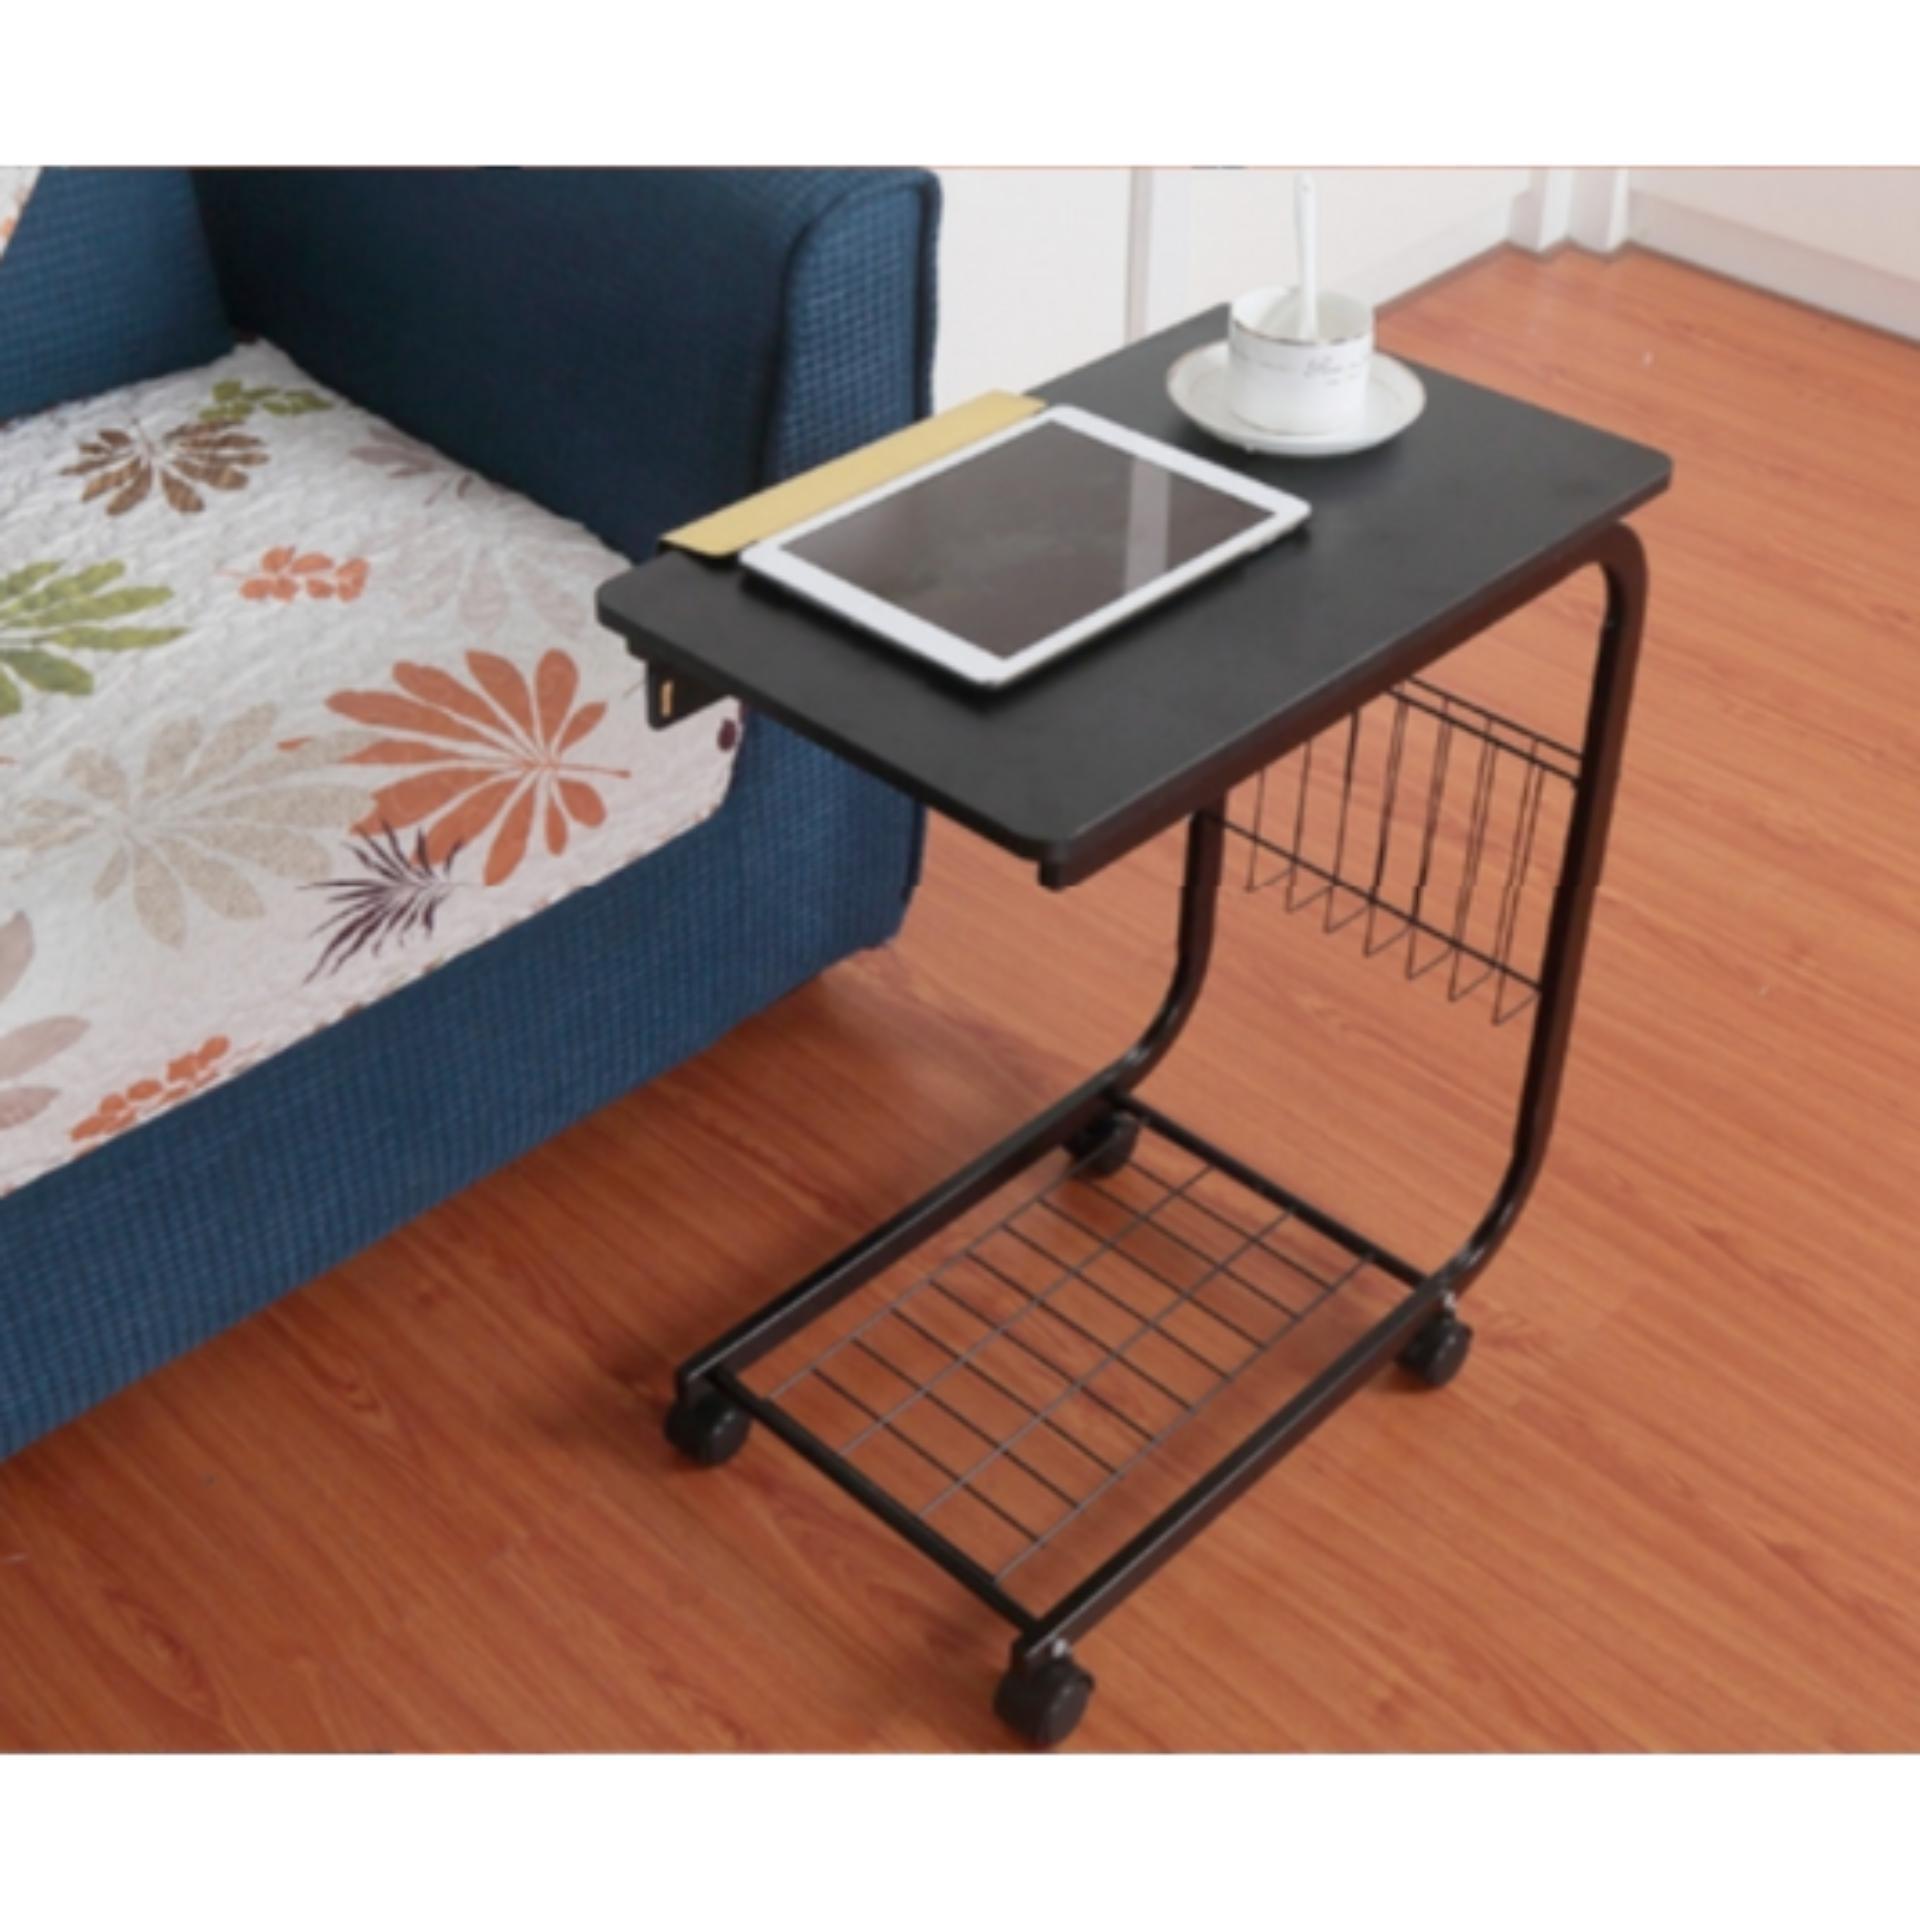 Shoppy Uni Movable Coffee Table / Laptop / Study / Bed / Kitchen / Office |  Lazada Singapore